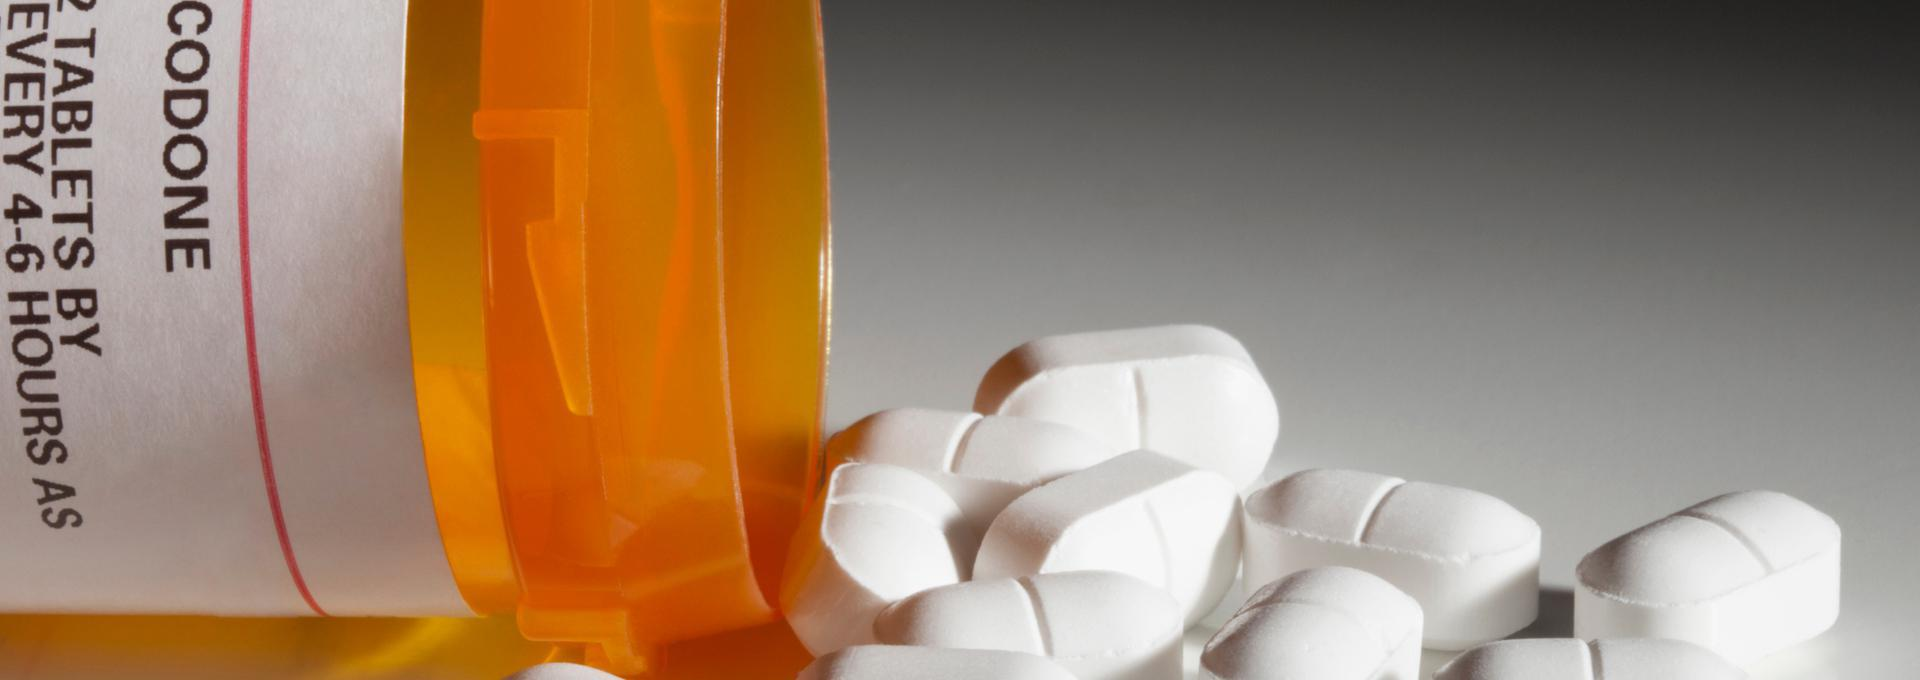 Hydrocodone Drug Test - info-hero